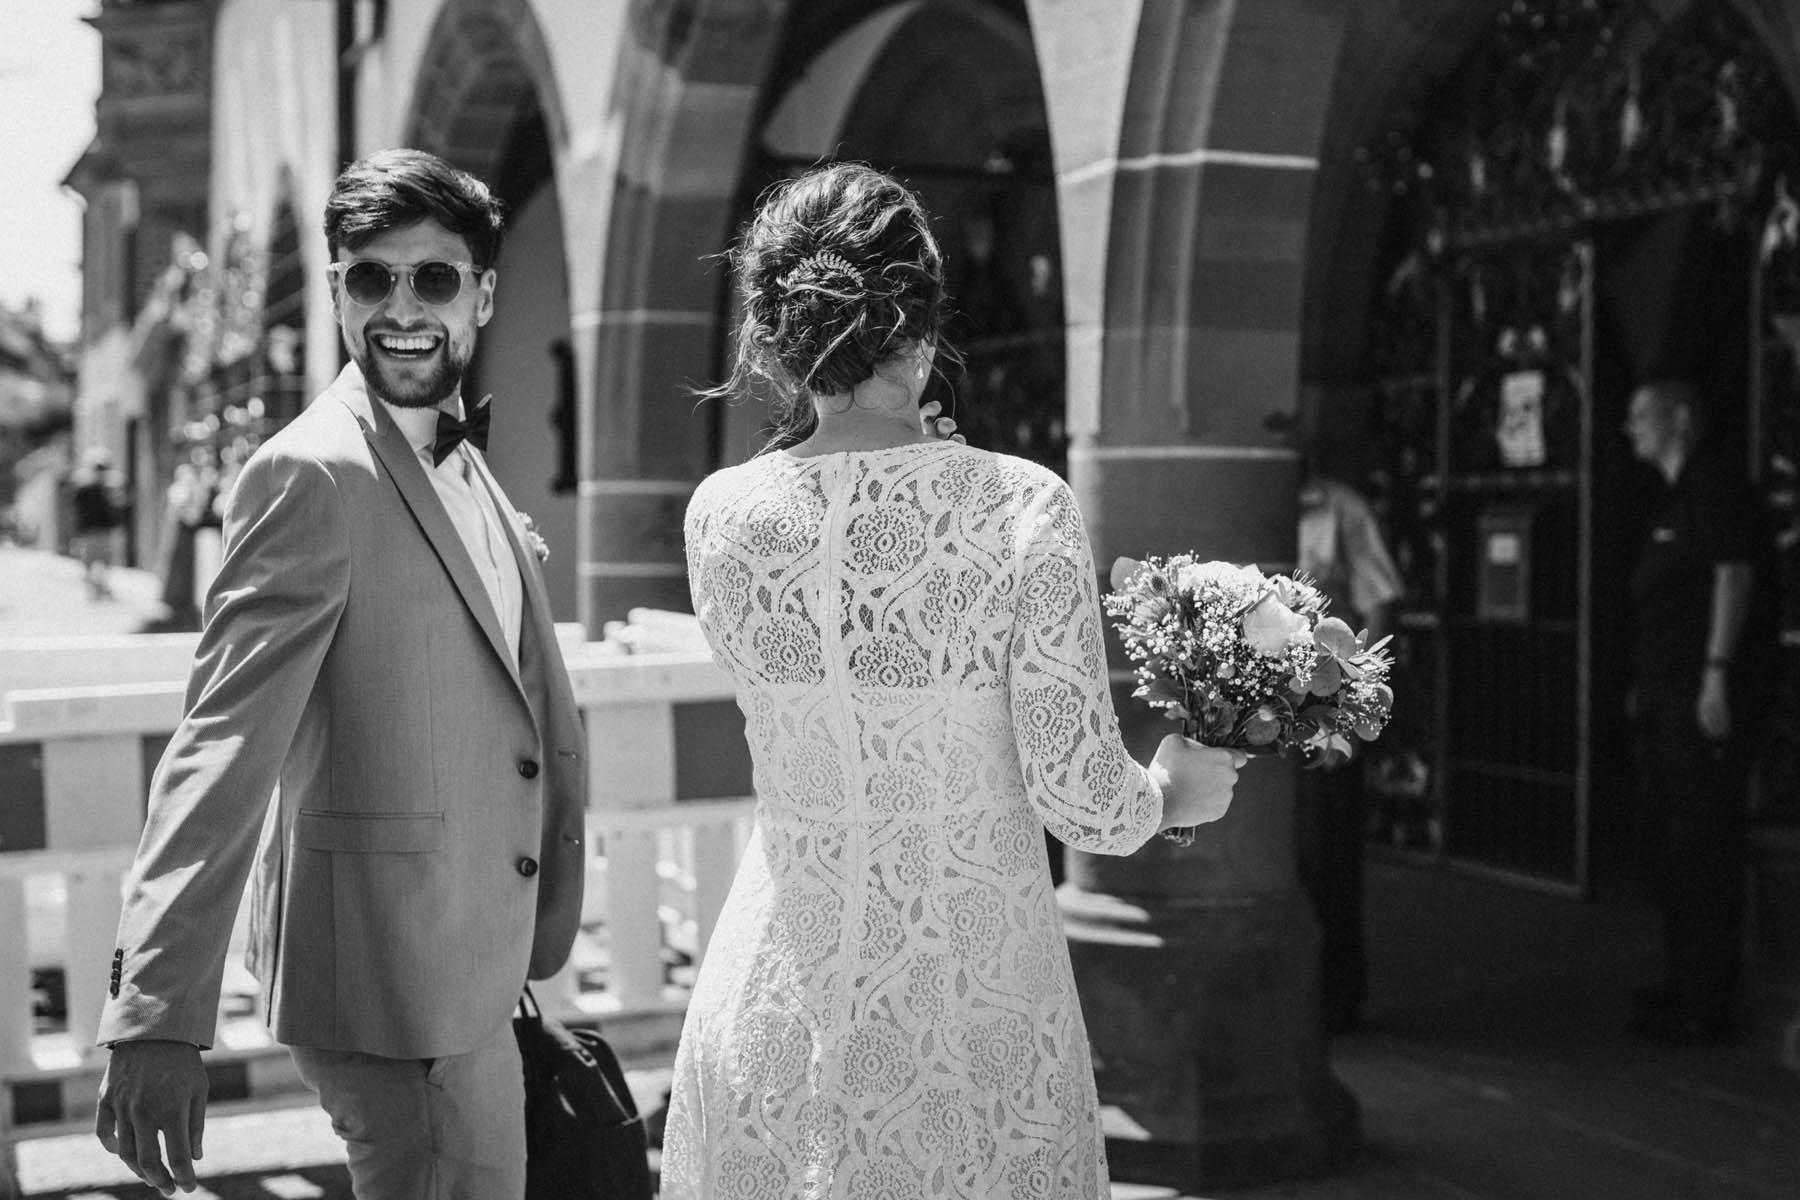 raissa simon fotografie elopement freiburg standesamt 005 - Julia + Tobias